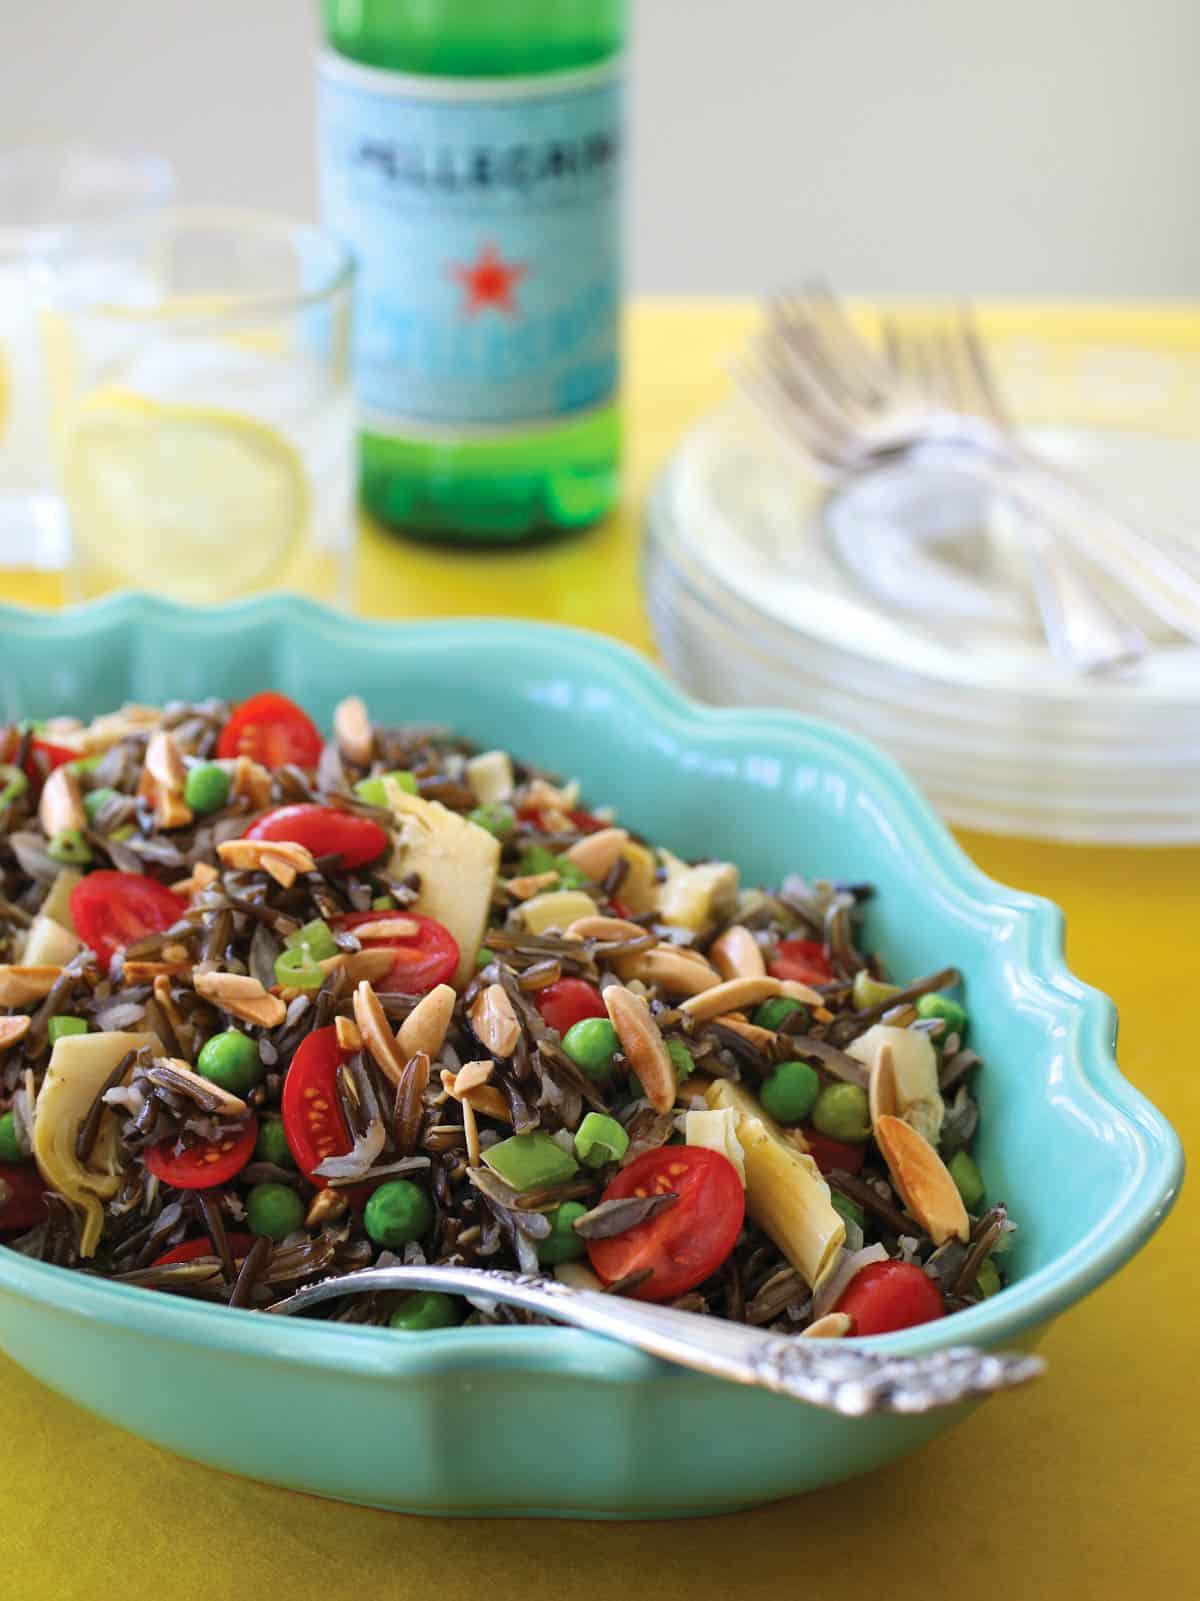 Oval blue bowl filled with Elegant Wild Rice Salad with Parmesan Vinaigrette